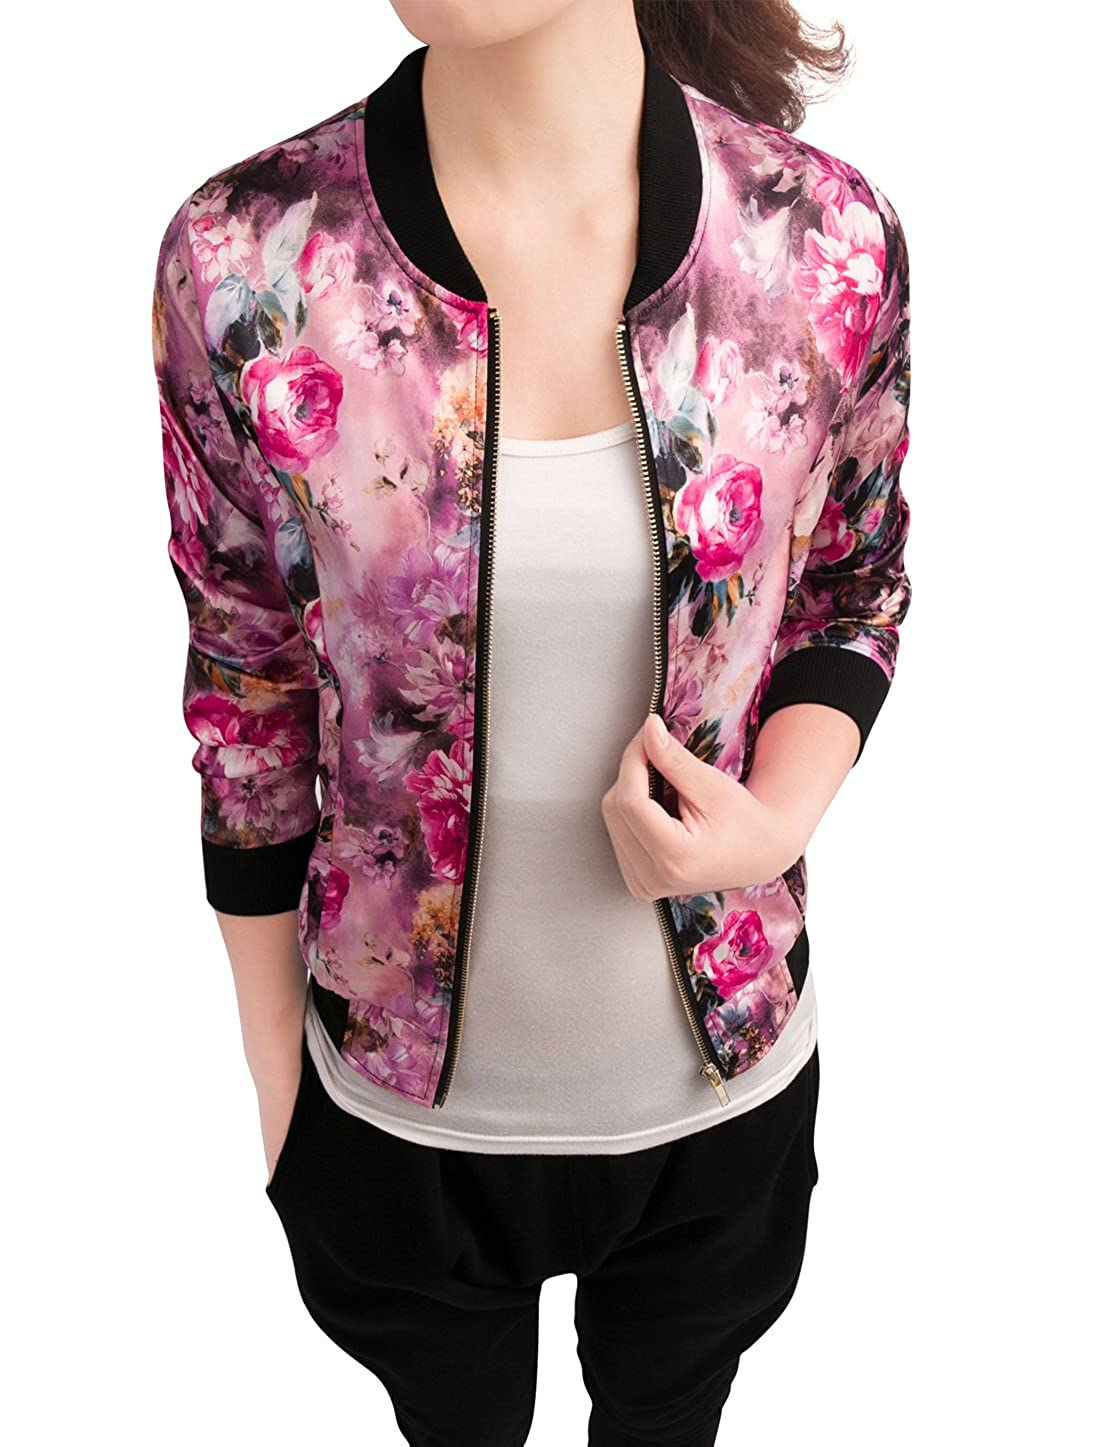 faf468743 Allegra K Women's Stand Collar Zip Up Floral Prints Bomber Jacket